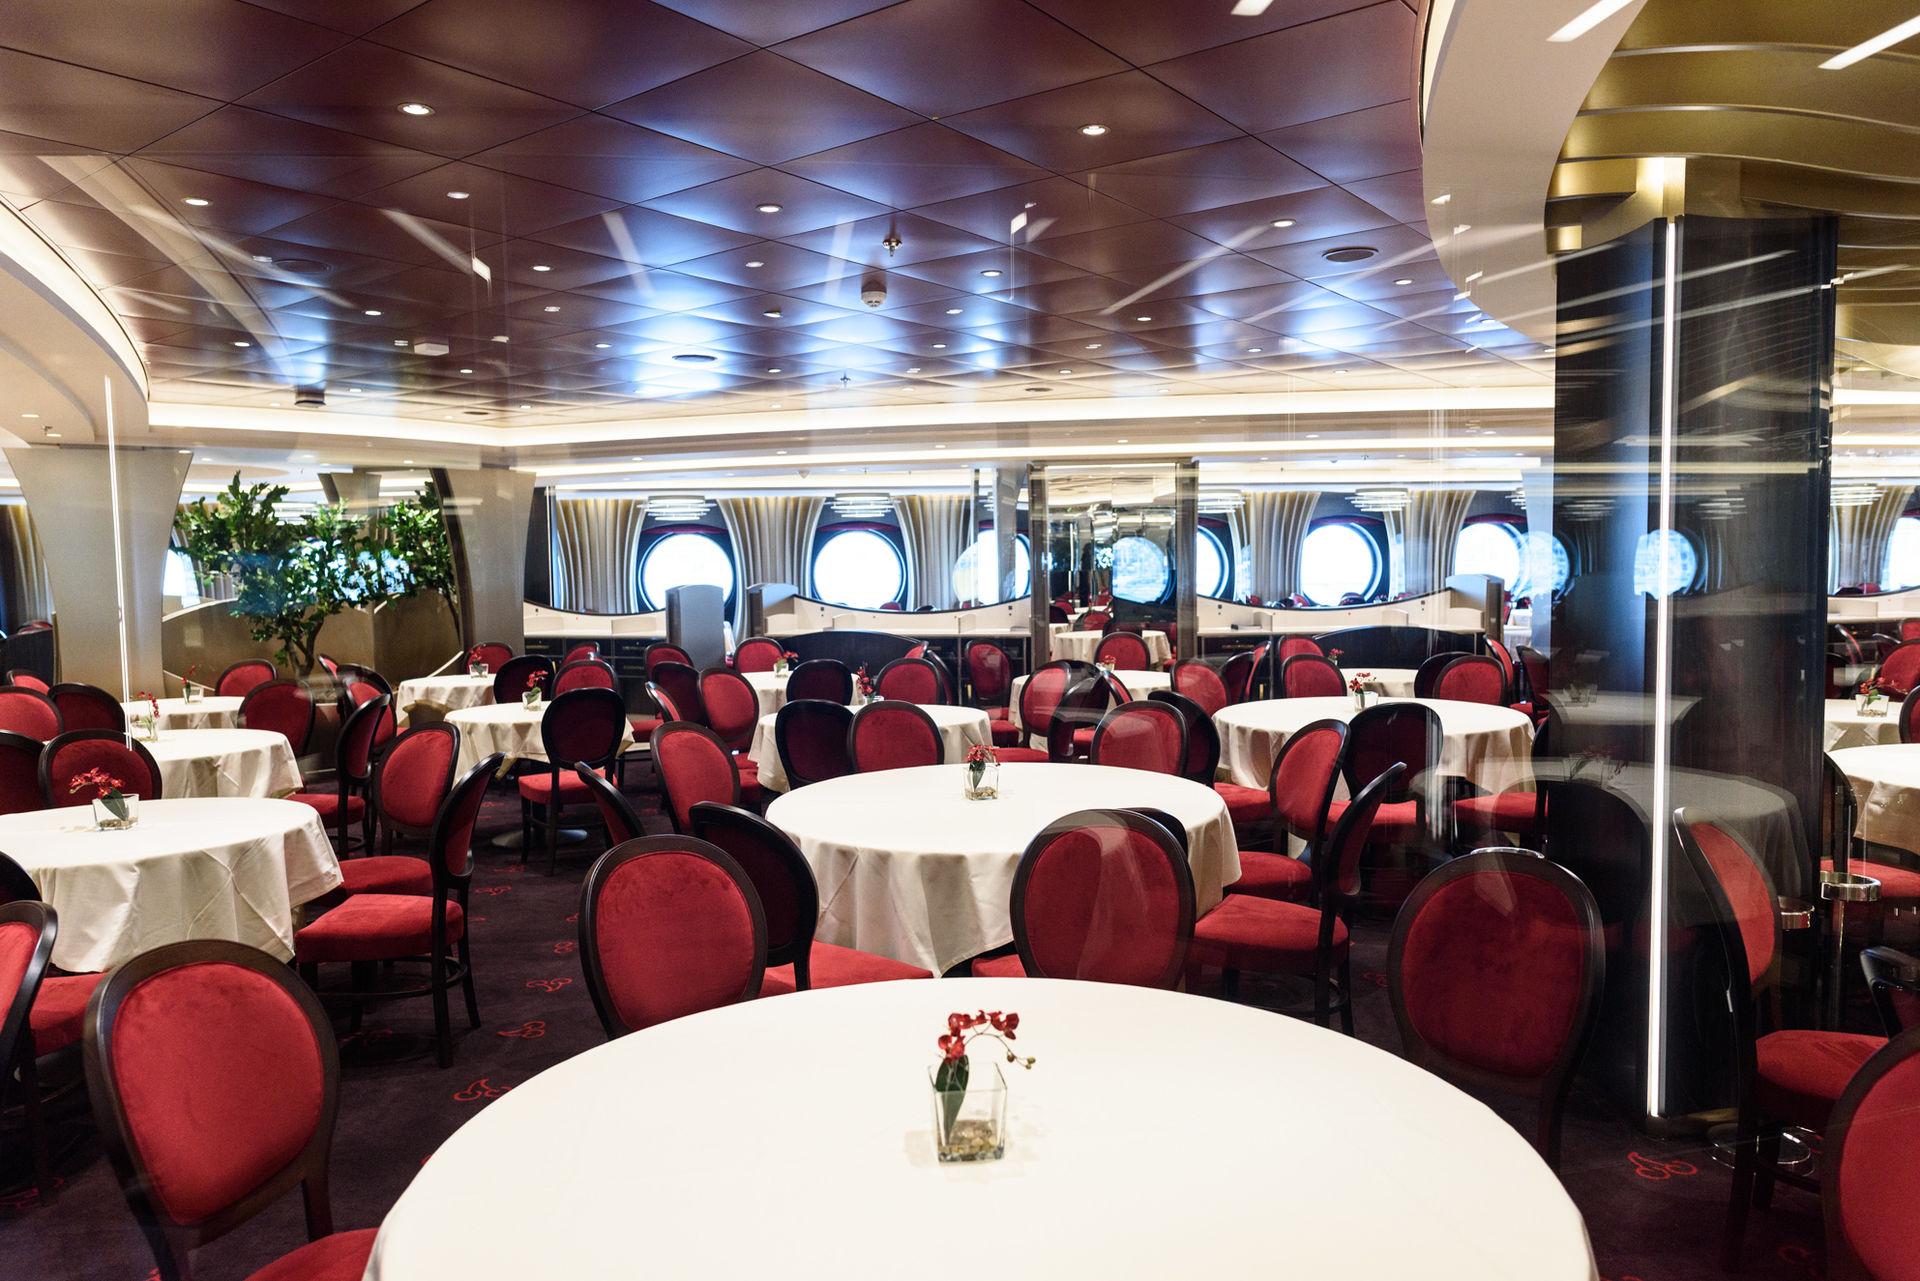 interior-restaurante-crucero-msc.jpg